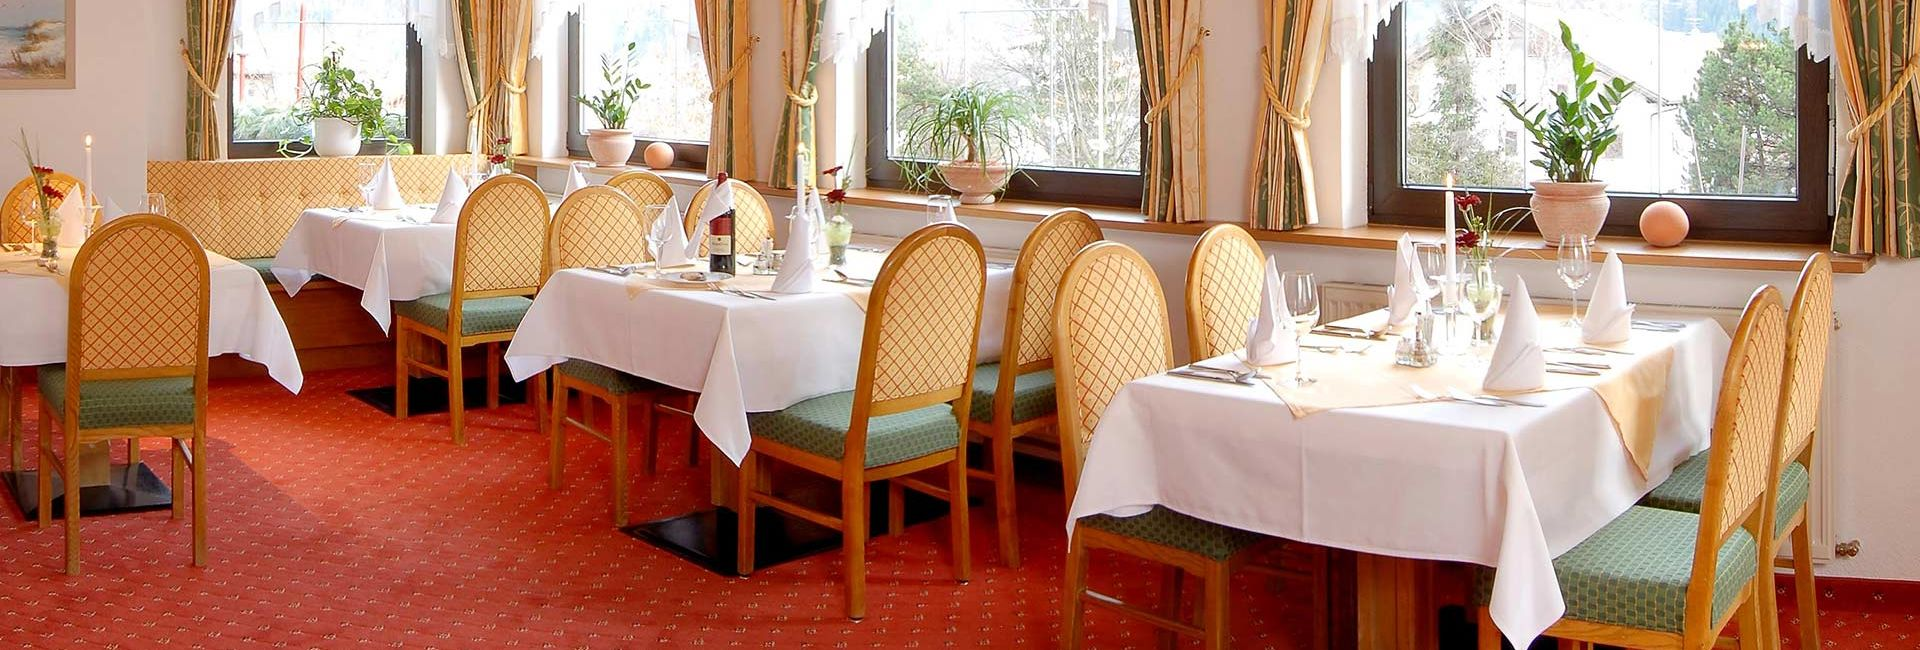 Restaurant: Hotel Edelweiss in Pfunds